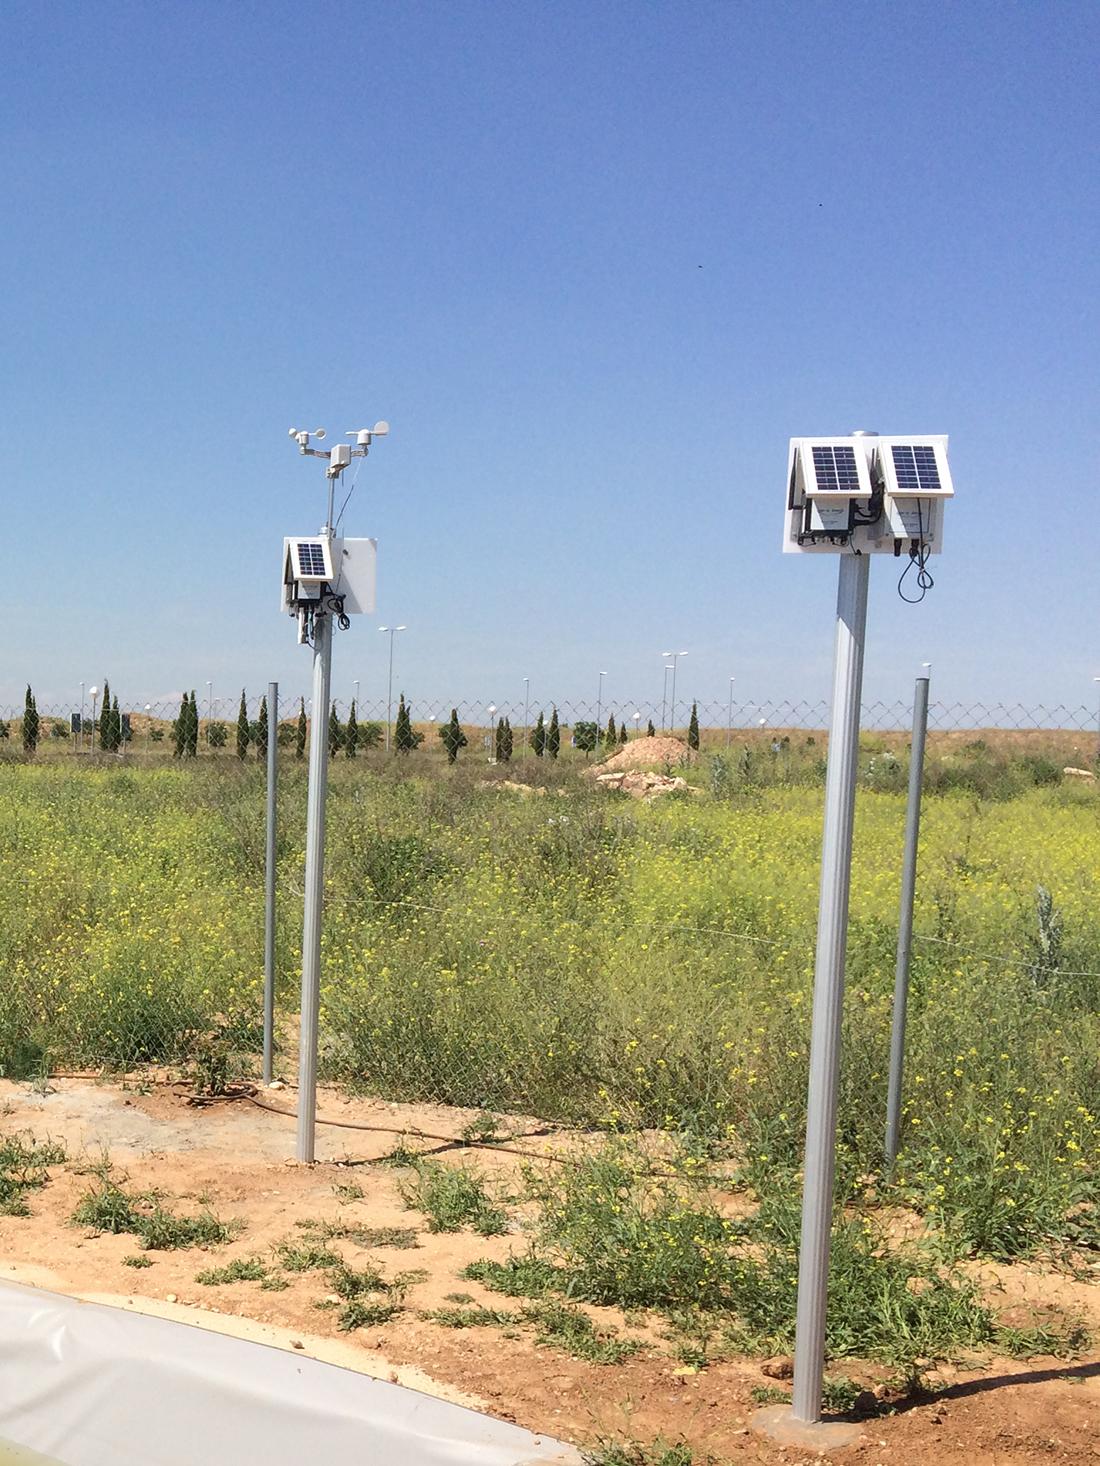 Waspmote Plug & Sense! Sensor Platforms at the wetland